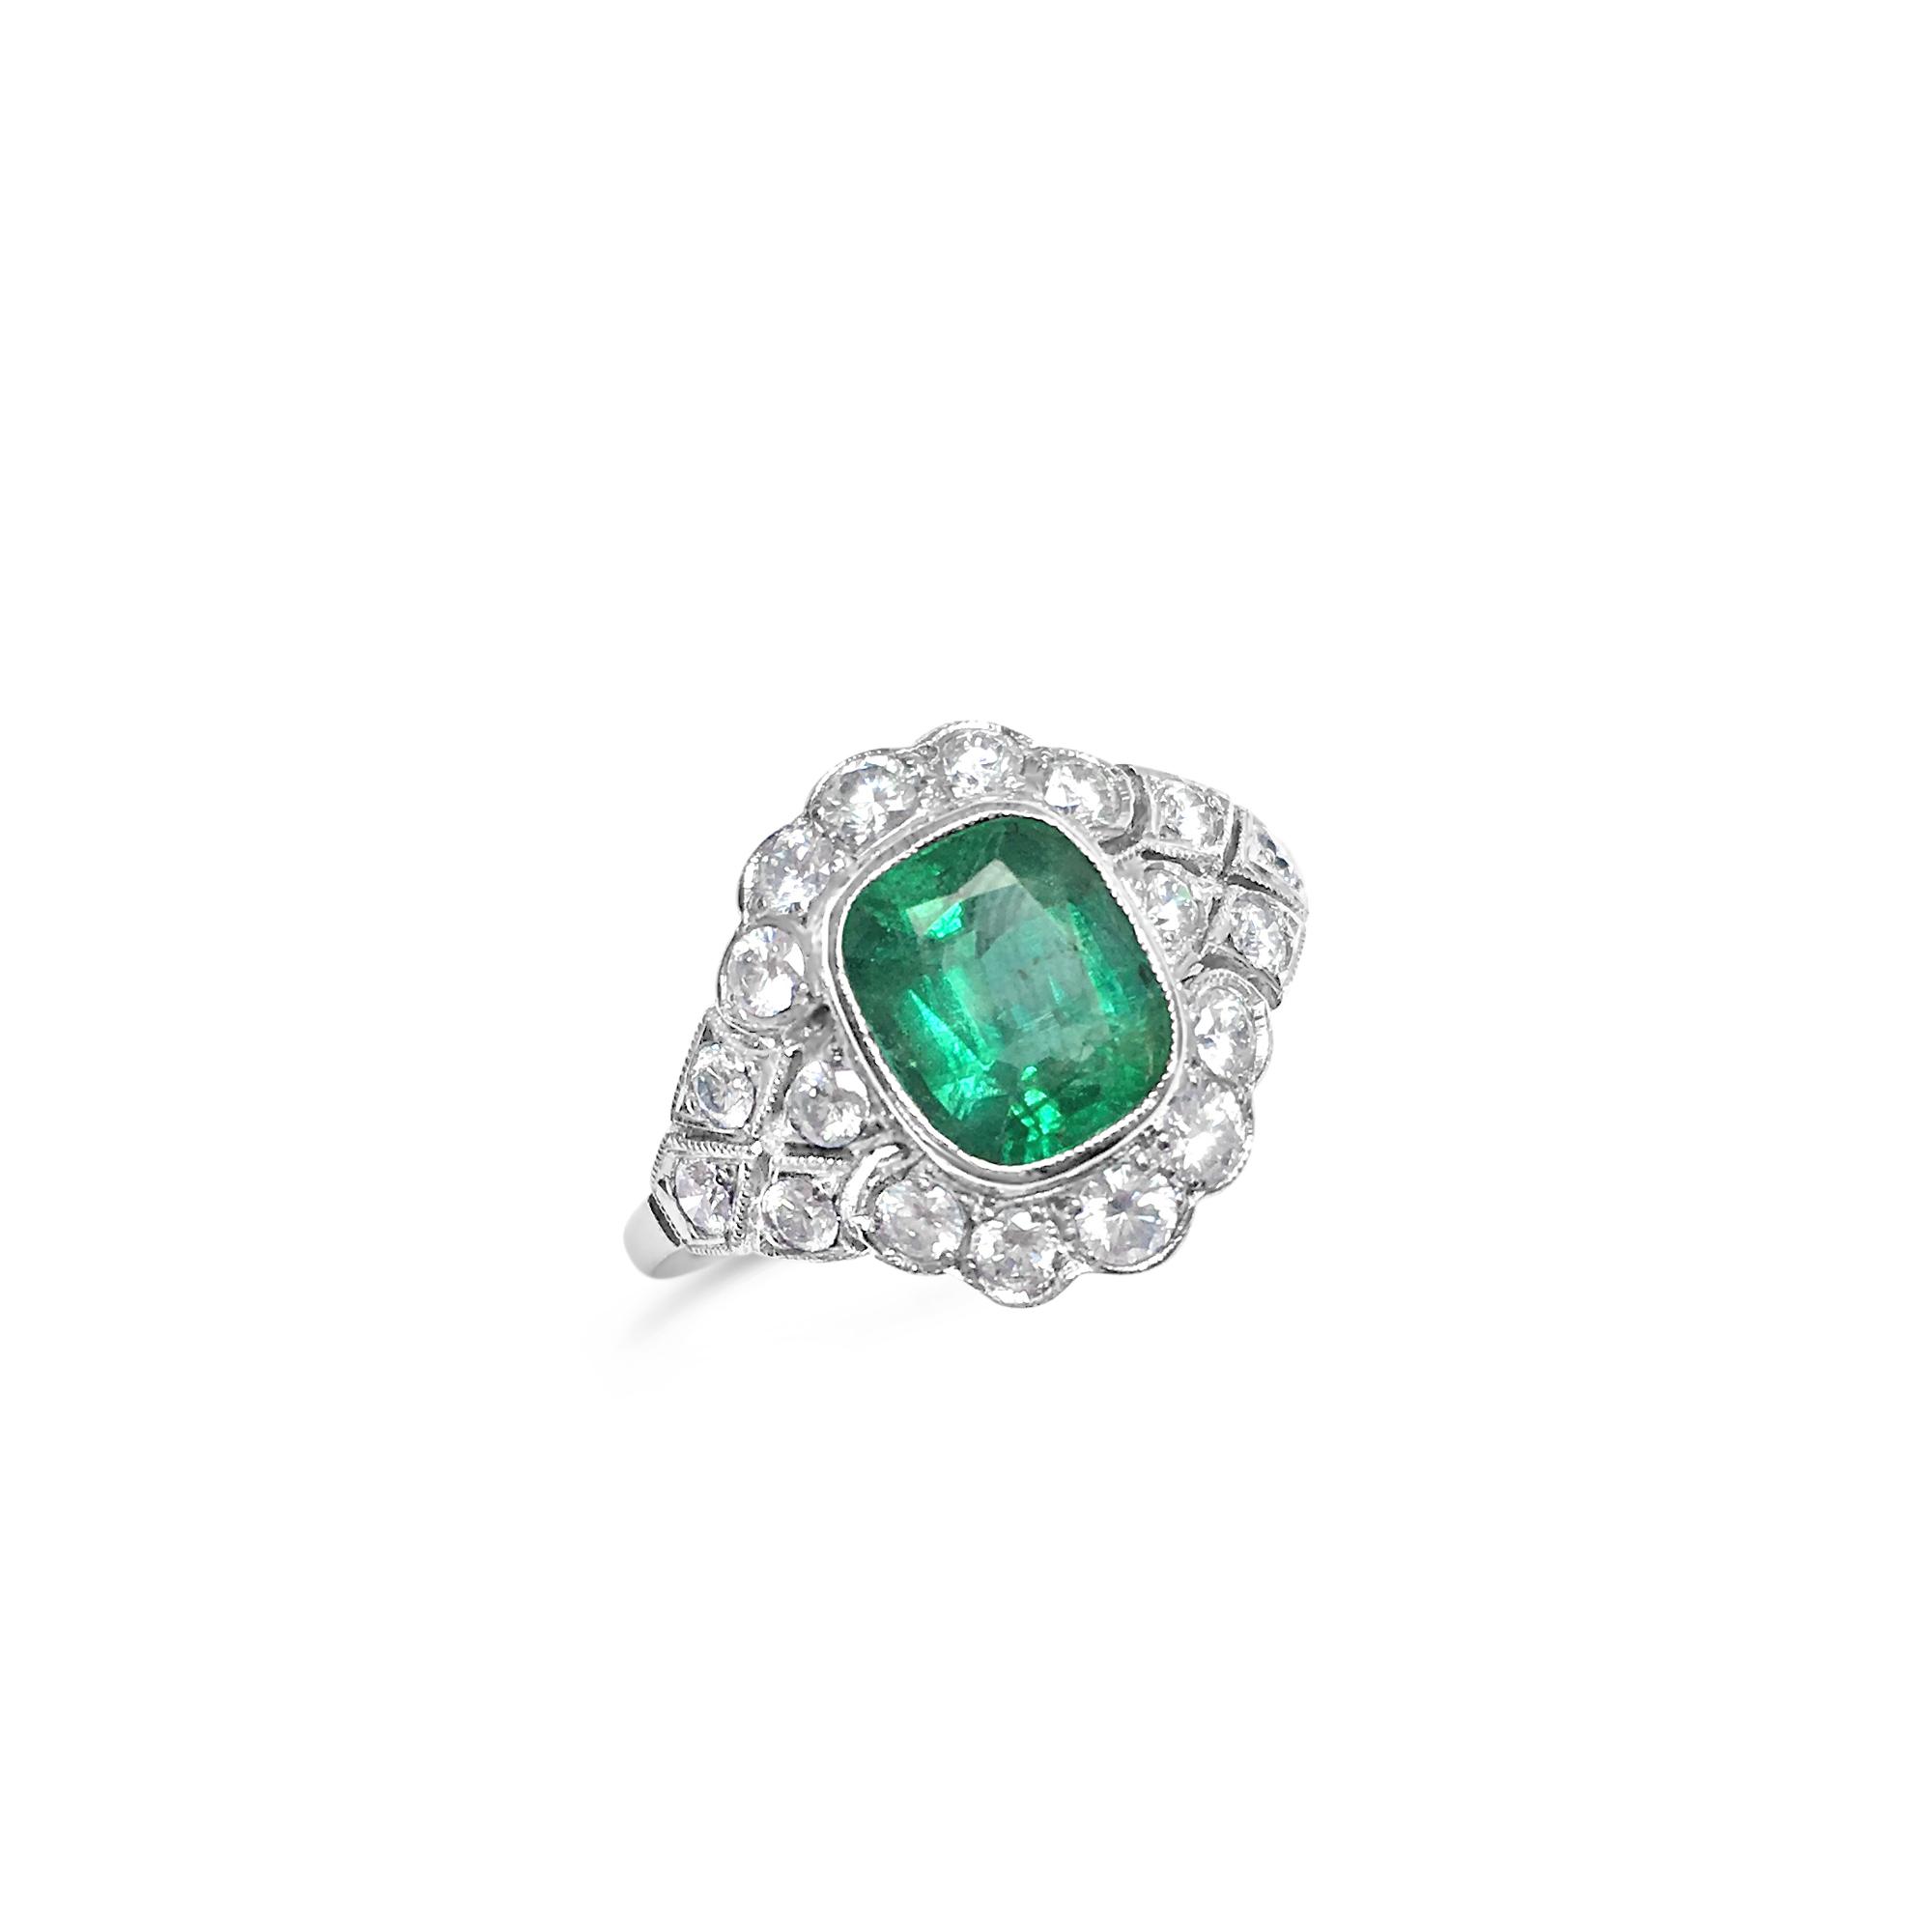 Cushion-cut Emerald ring